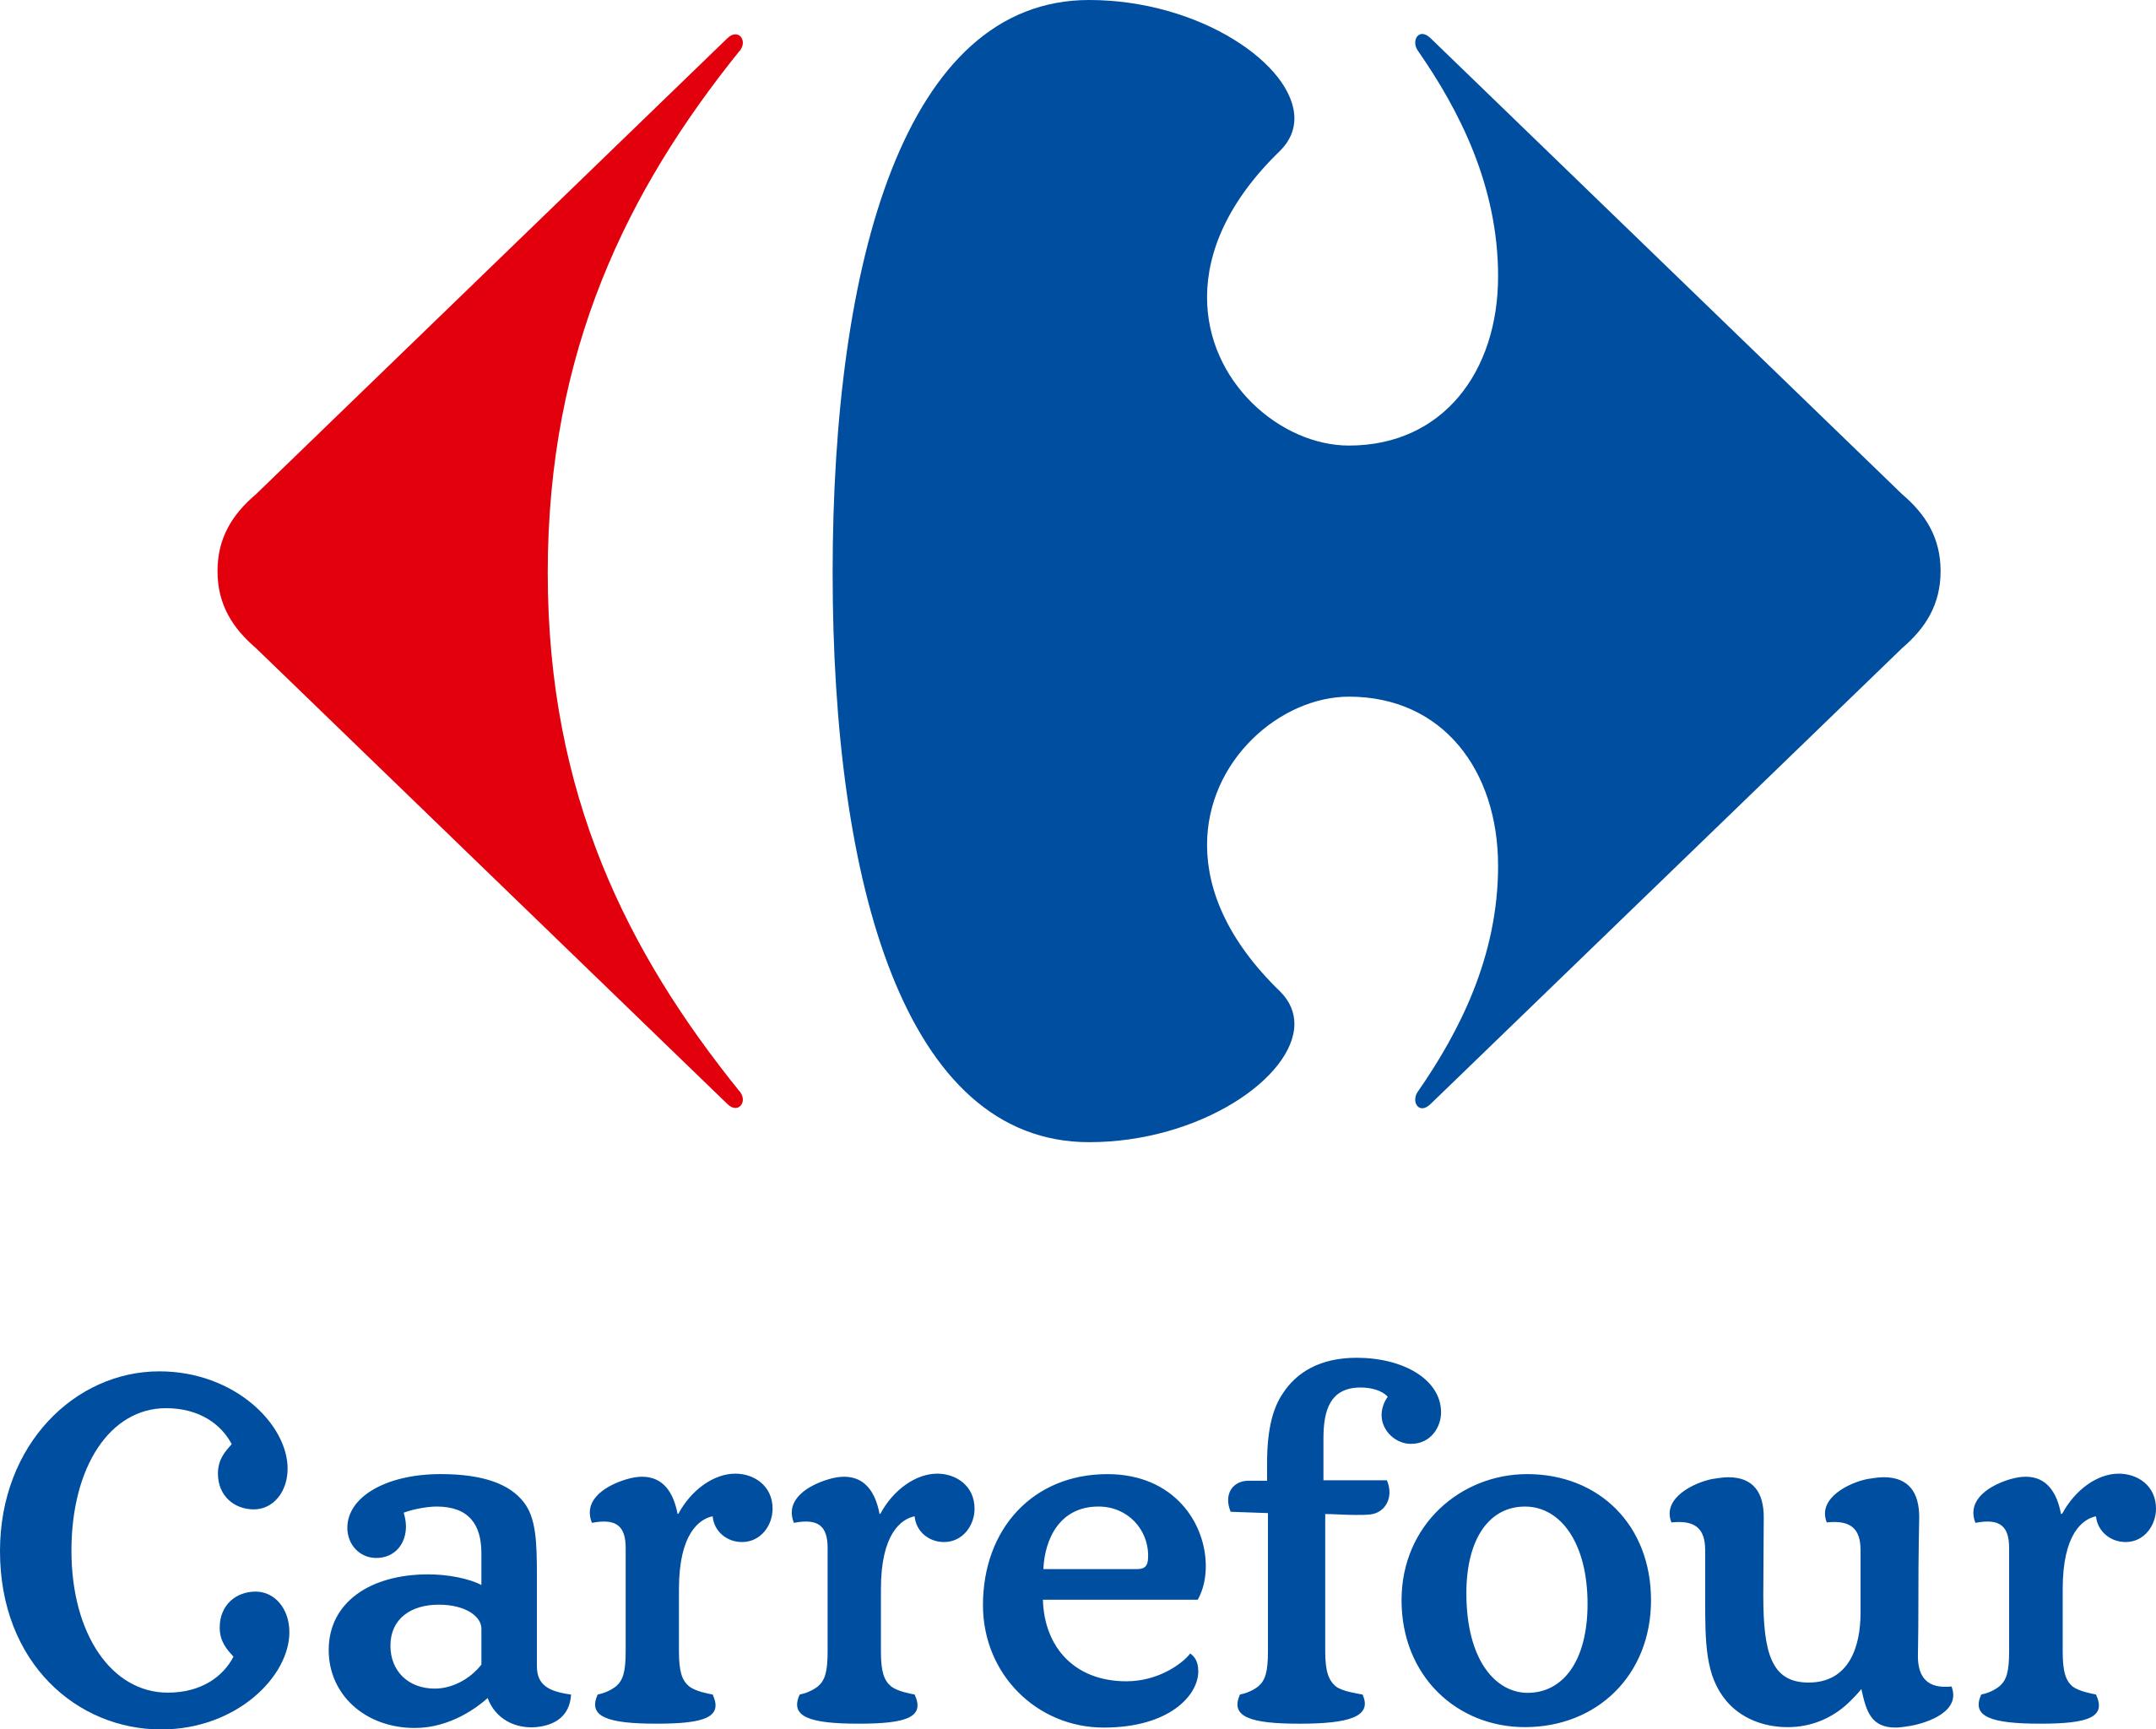 20€ de descuento para primera compra superior A 100 € En Carrefour Supermercado.